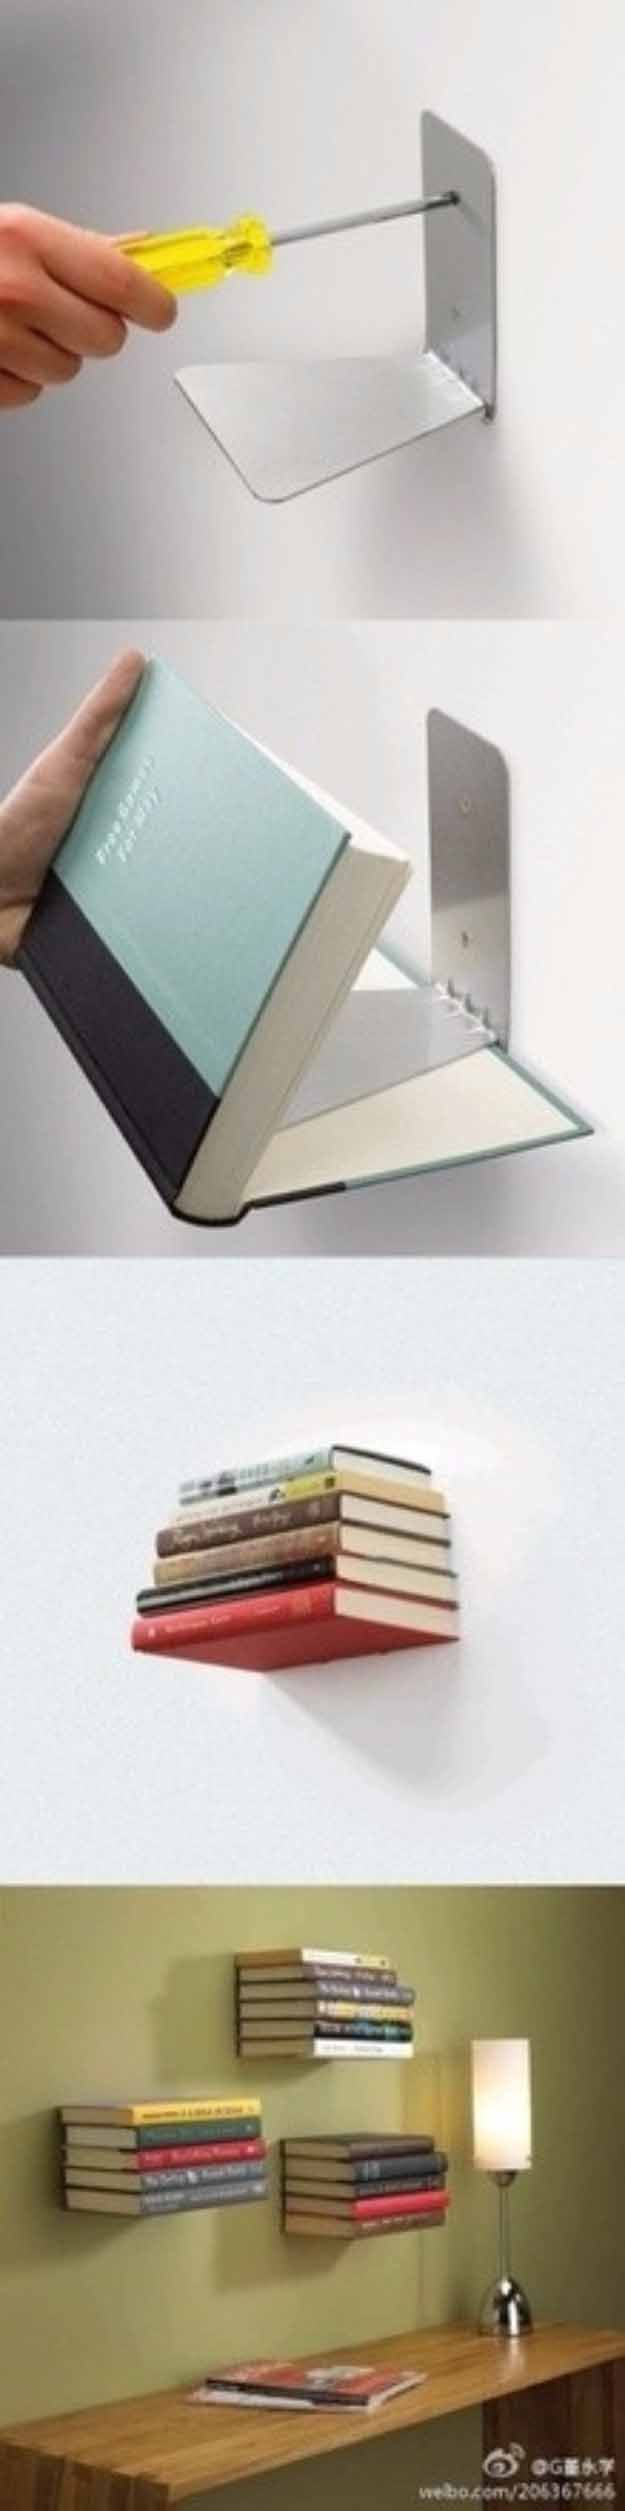 Homemade Bookshelf Ideas best 25+ bookshelf diy ideas on pinterest | bookshelf ideas, crate